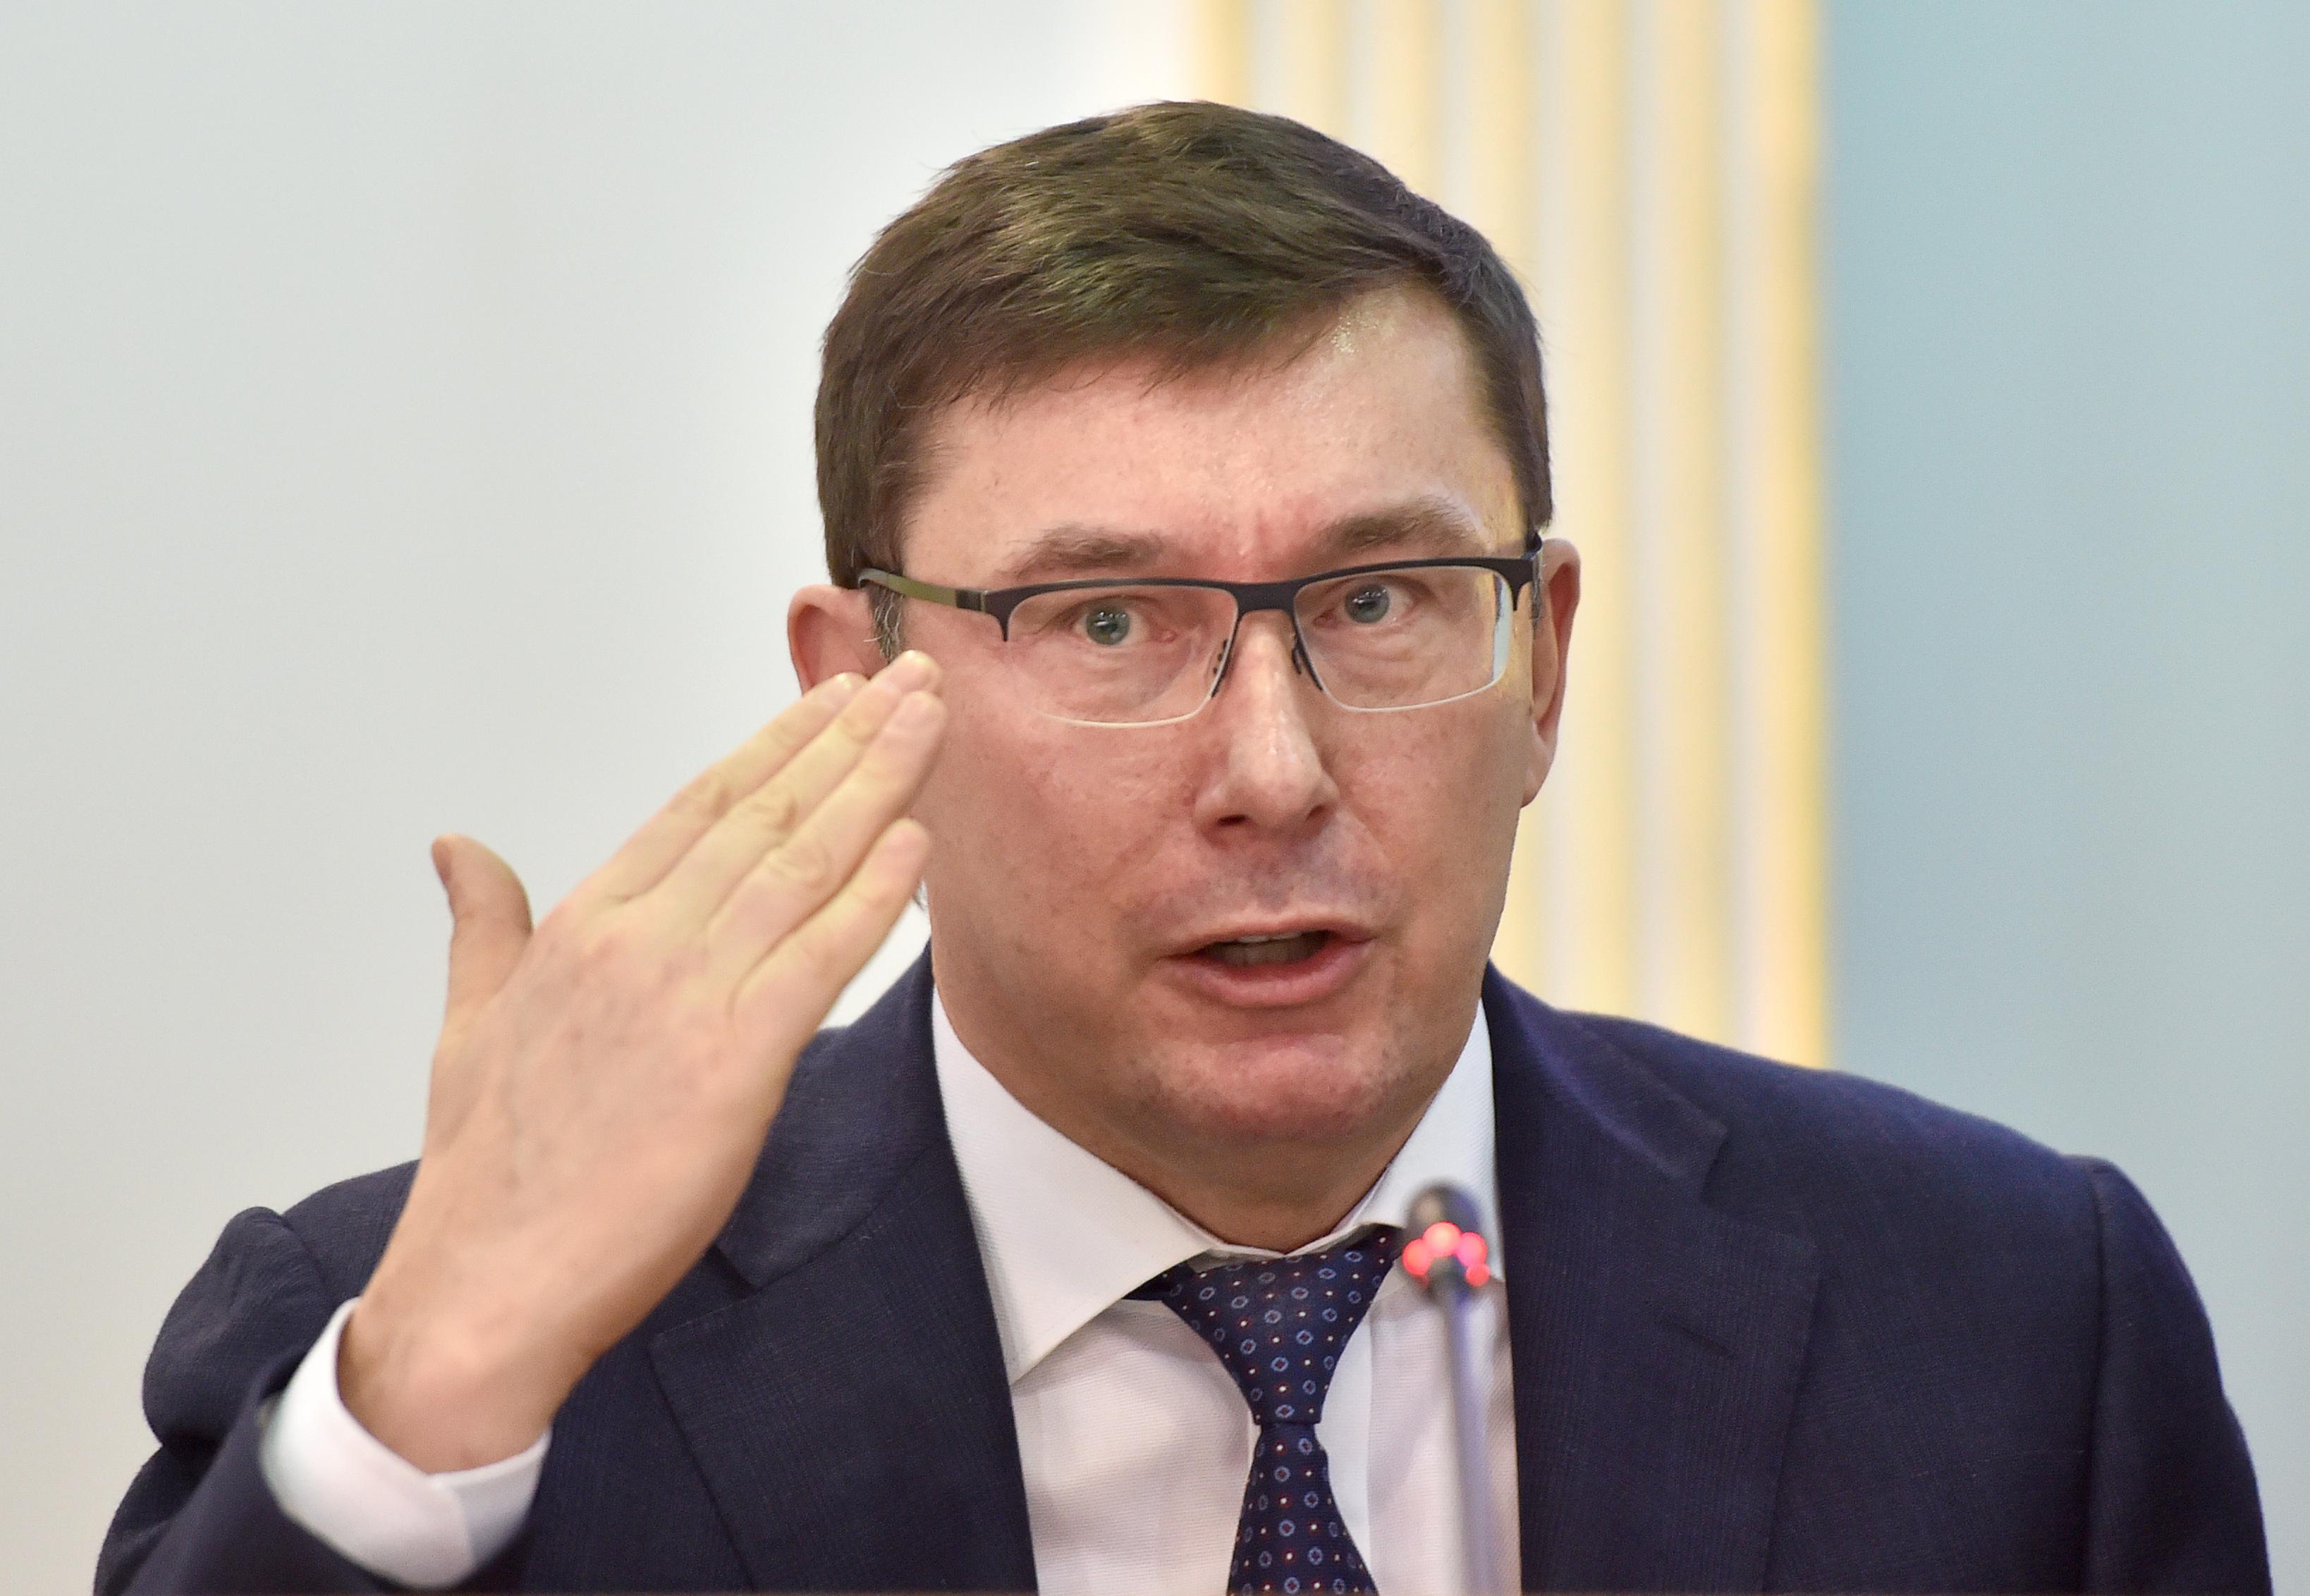 Former Ukrainian Prosecutor Says Yovanovitch Lied to Congress